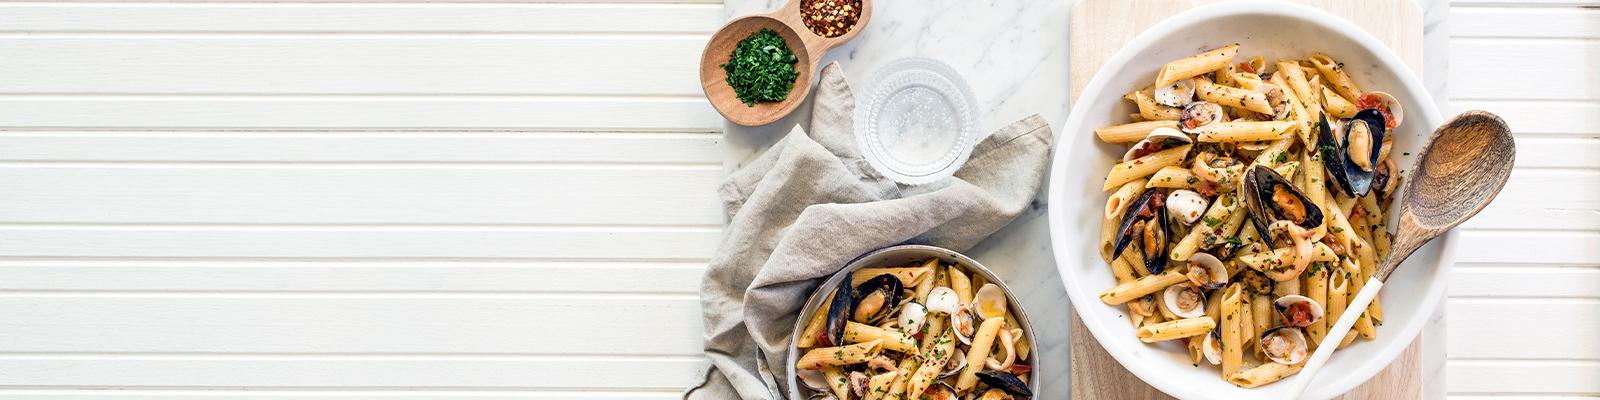 Pasta Garofalo - Our Recipes